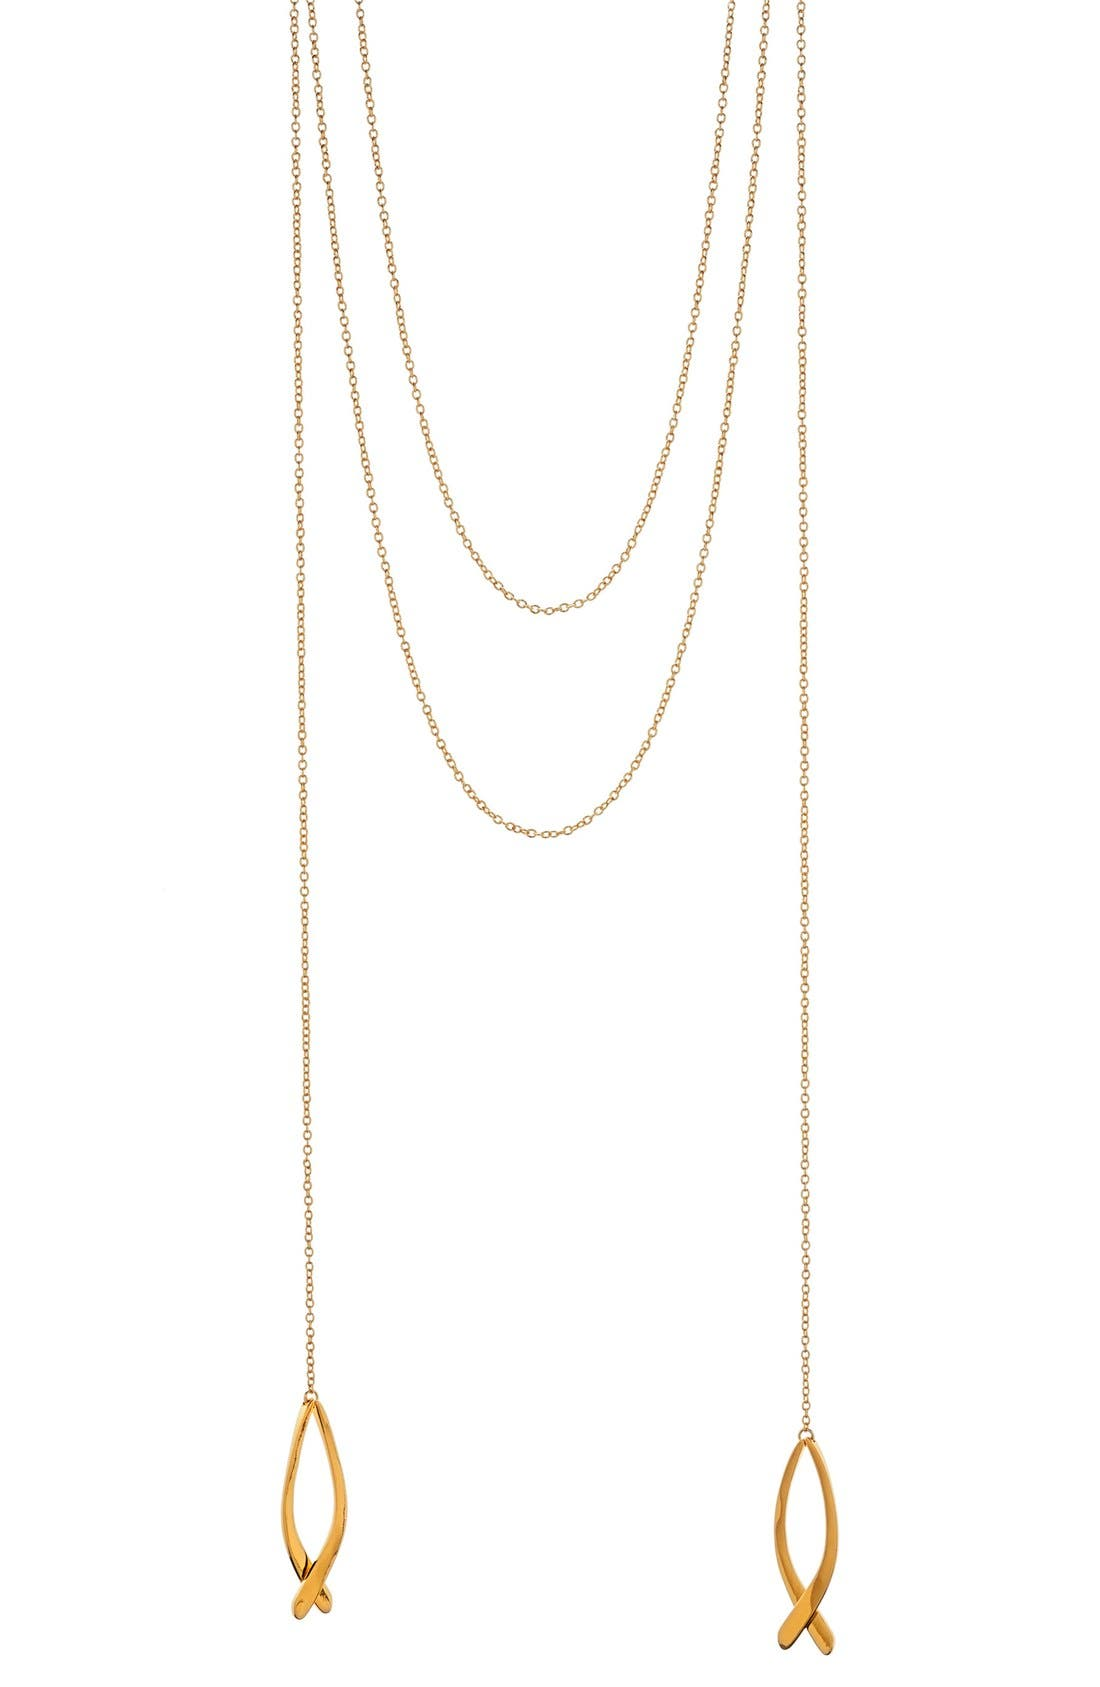 Alternate Image 1 Selected - gorjana'Viola' Layered Pendant Necklace